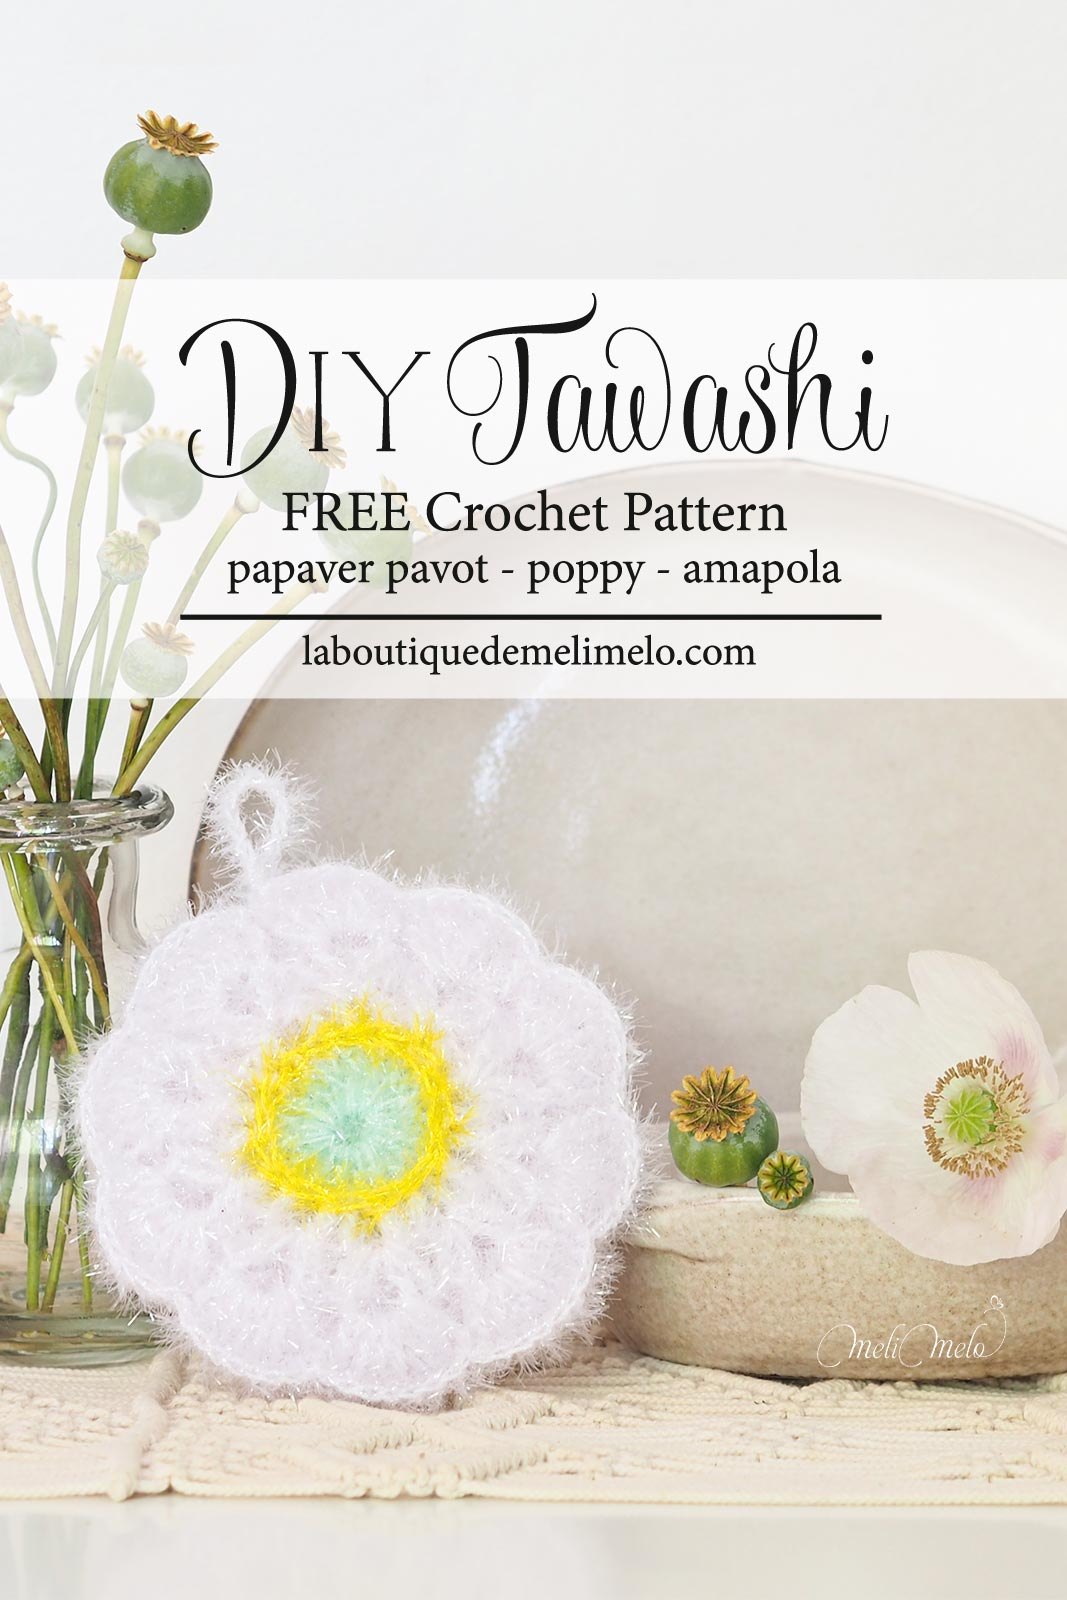 diy-crochet-tawashi-papaver-poppie-pavot-pattern-pinterest-laboutiquedemelimelo